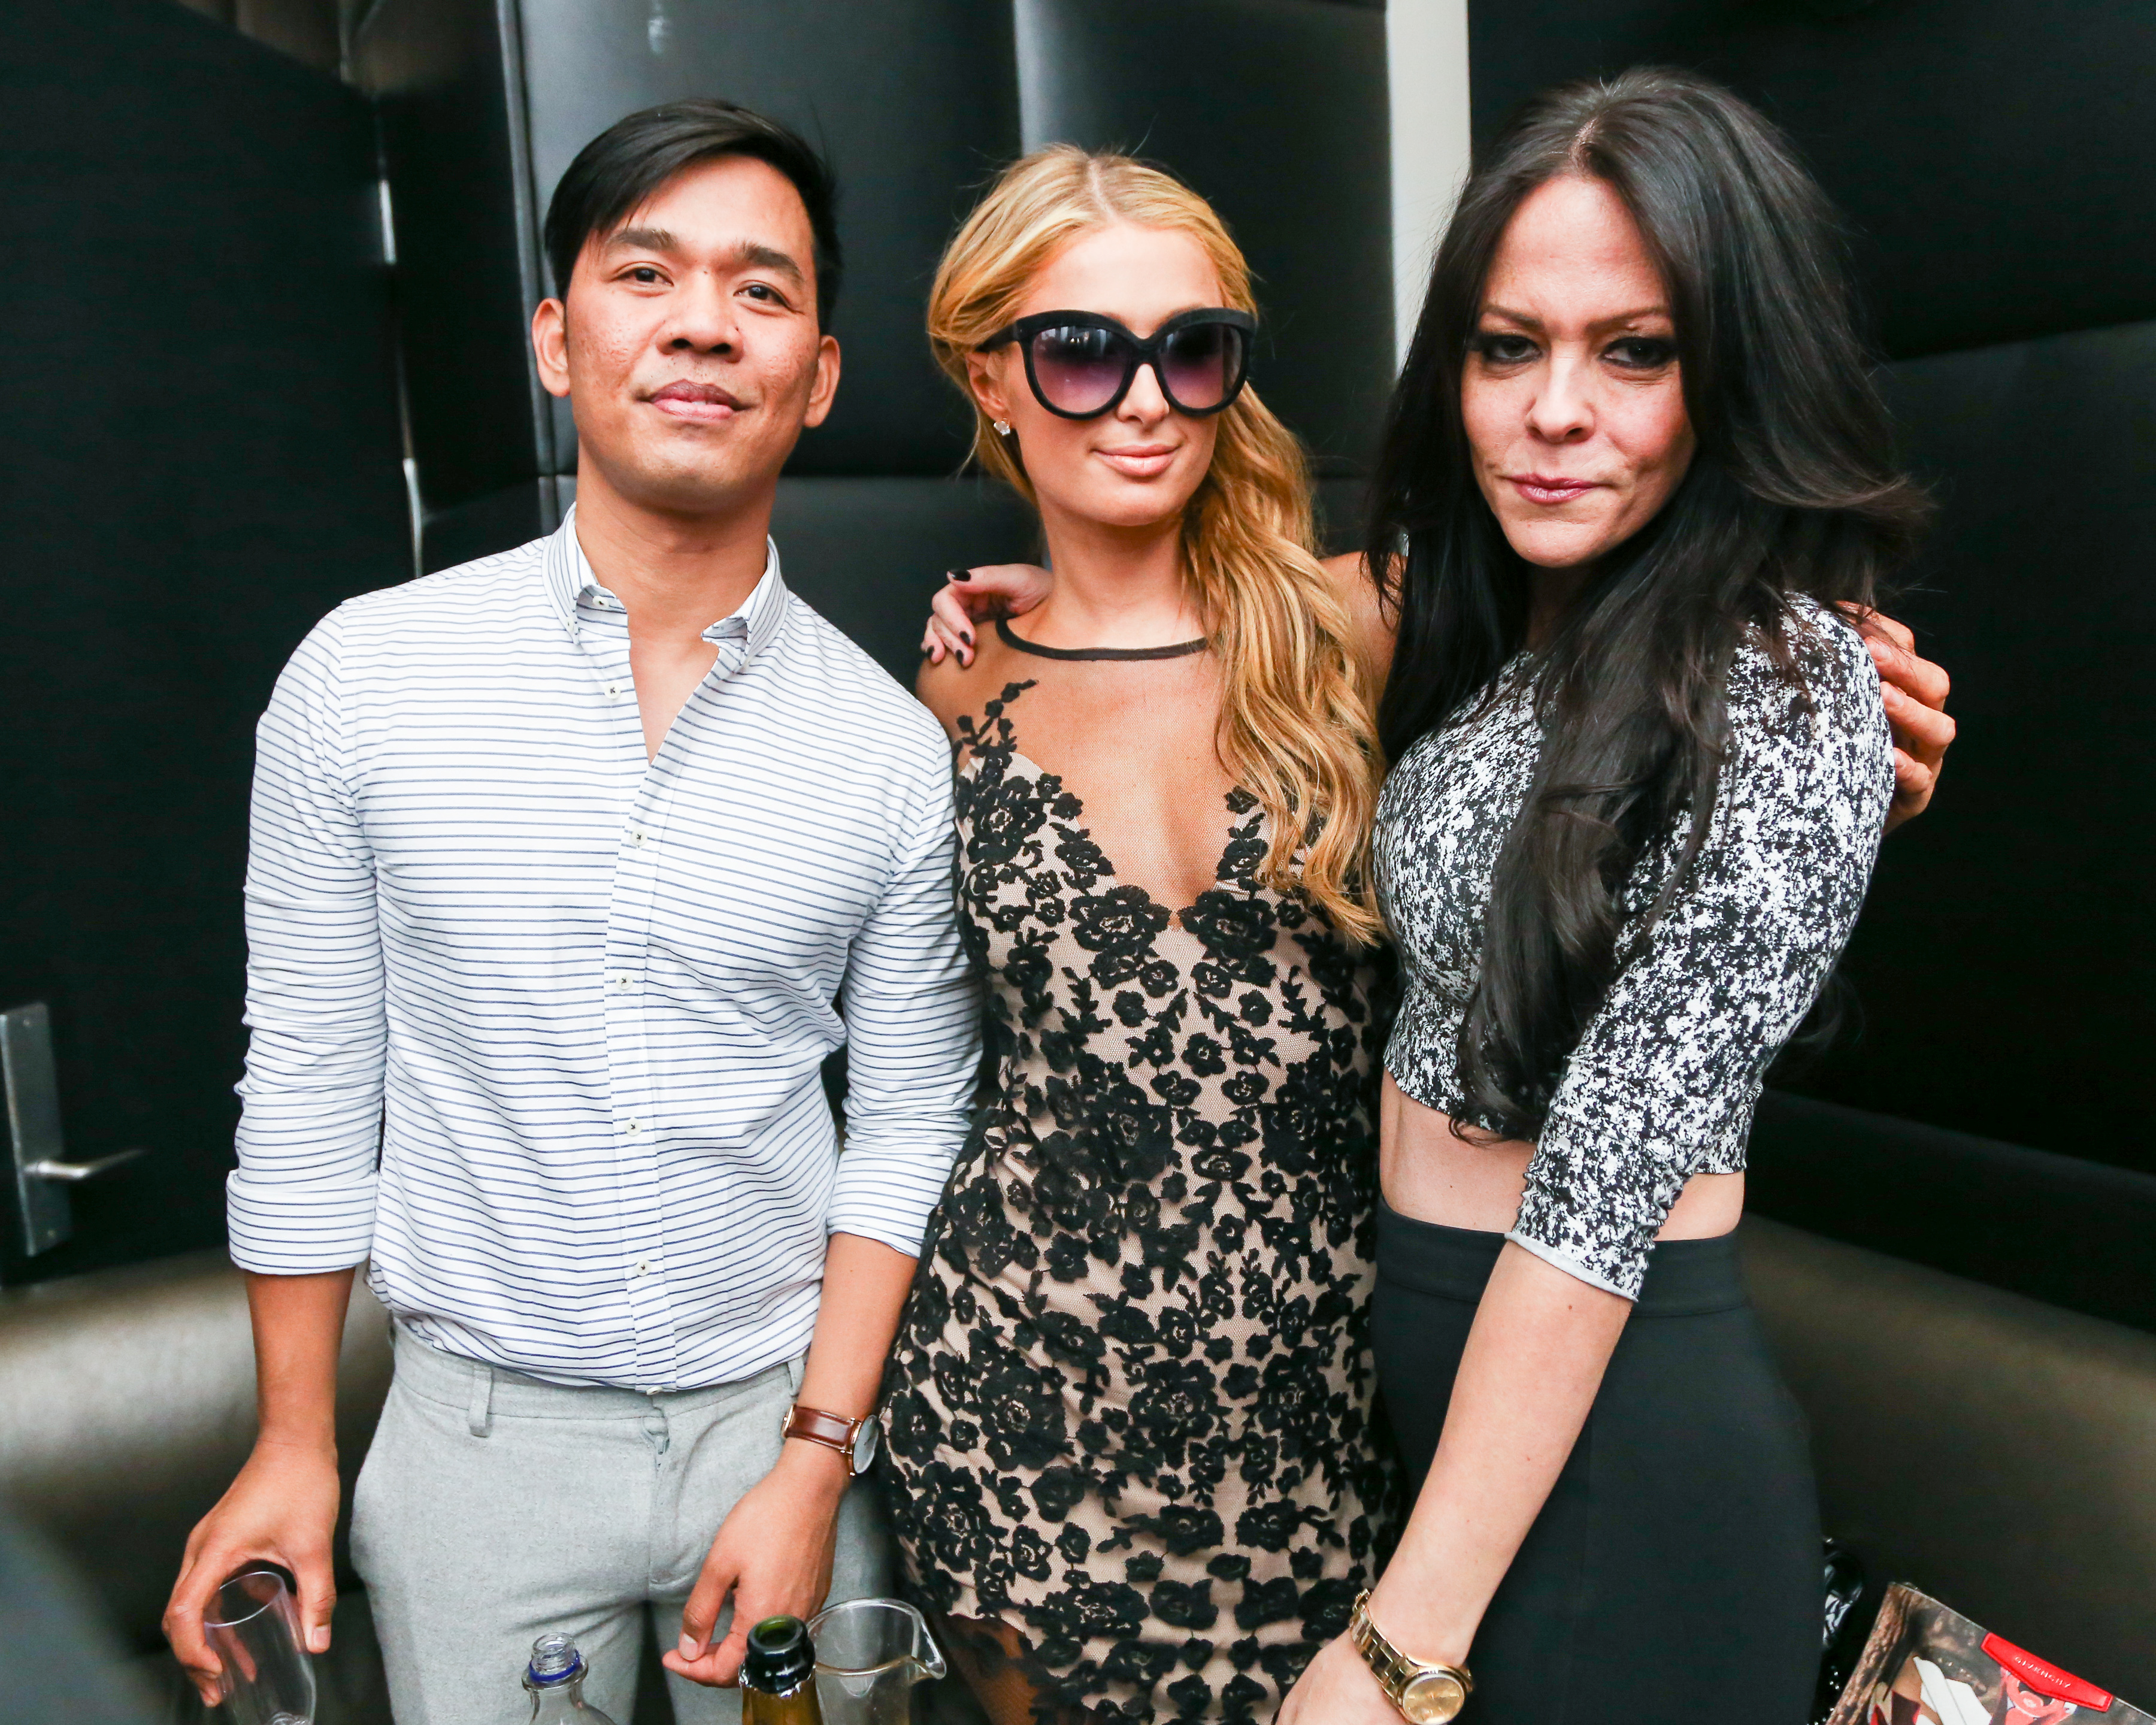 Renie Saliba, Paris Hilton, & Allison Melnick - ESSENTIAL HOMME's #EHNYFW and Spring Fashion Issue Launch Party